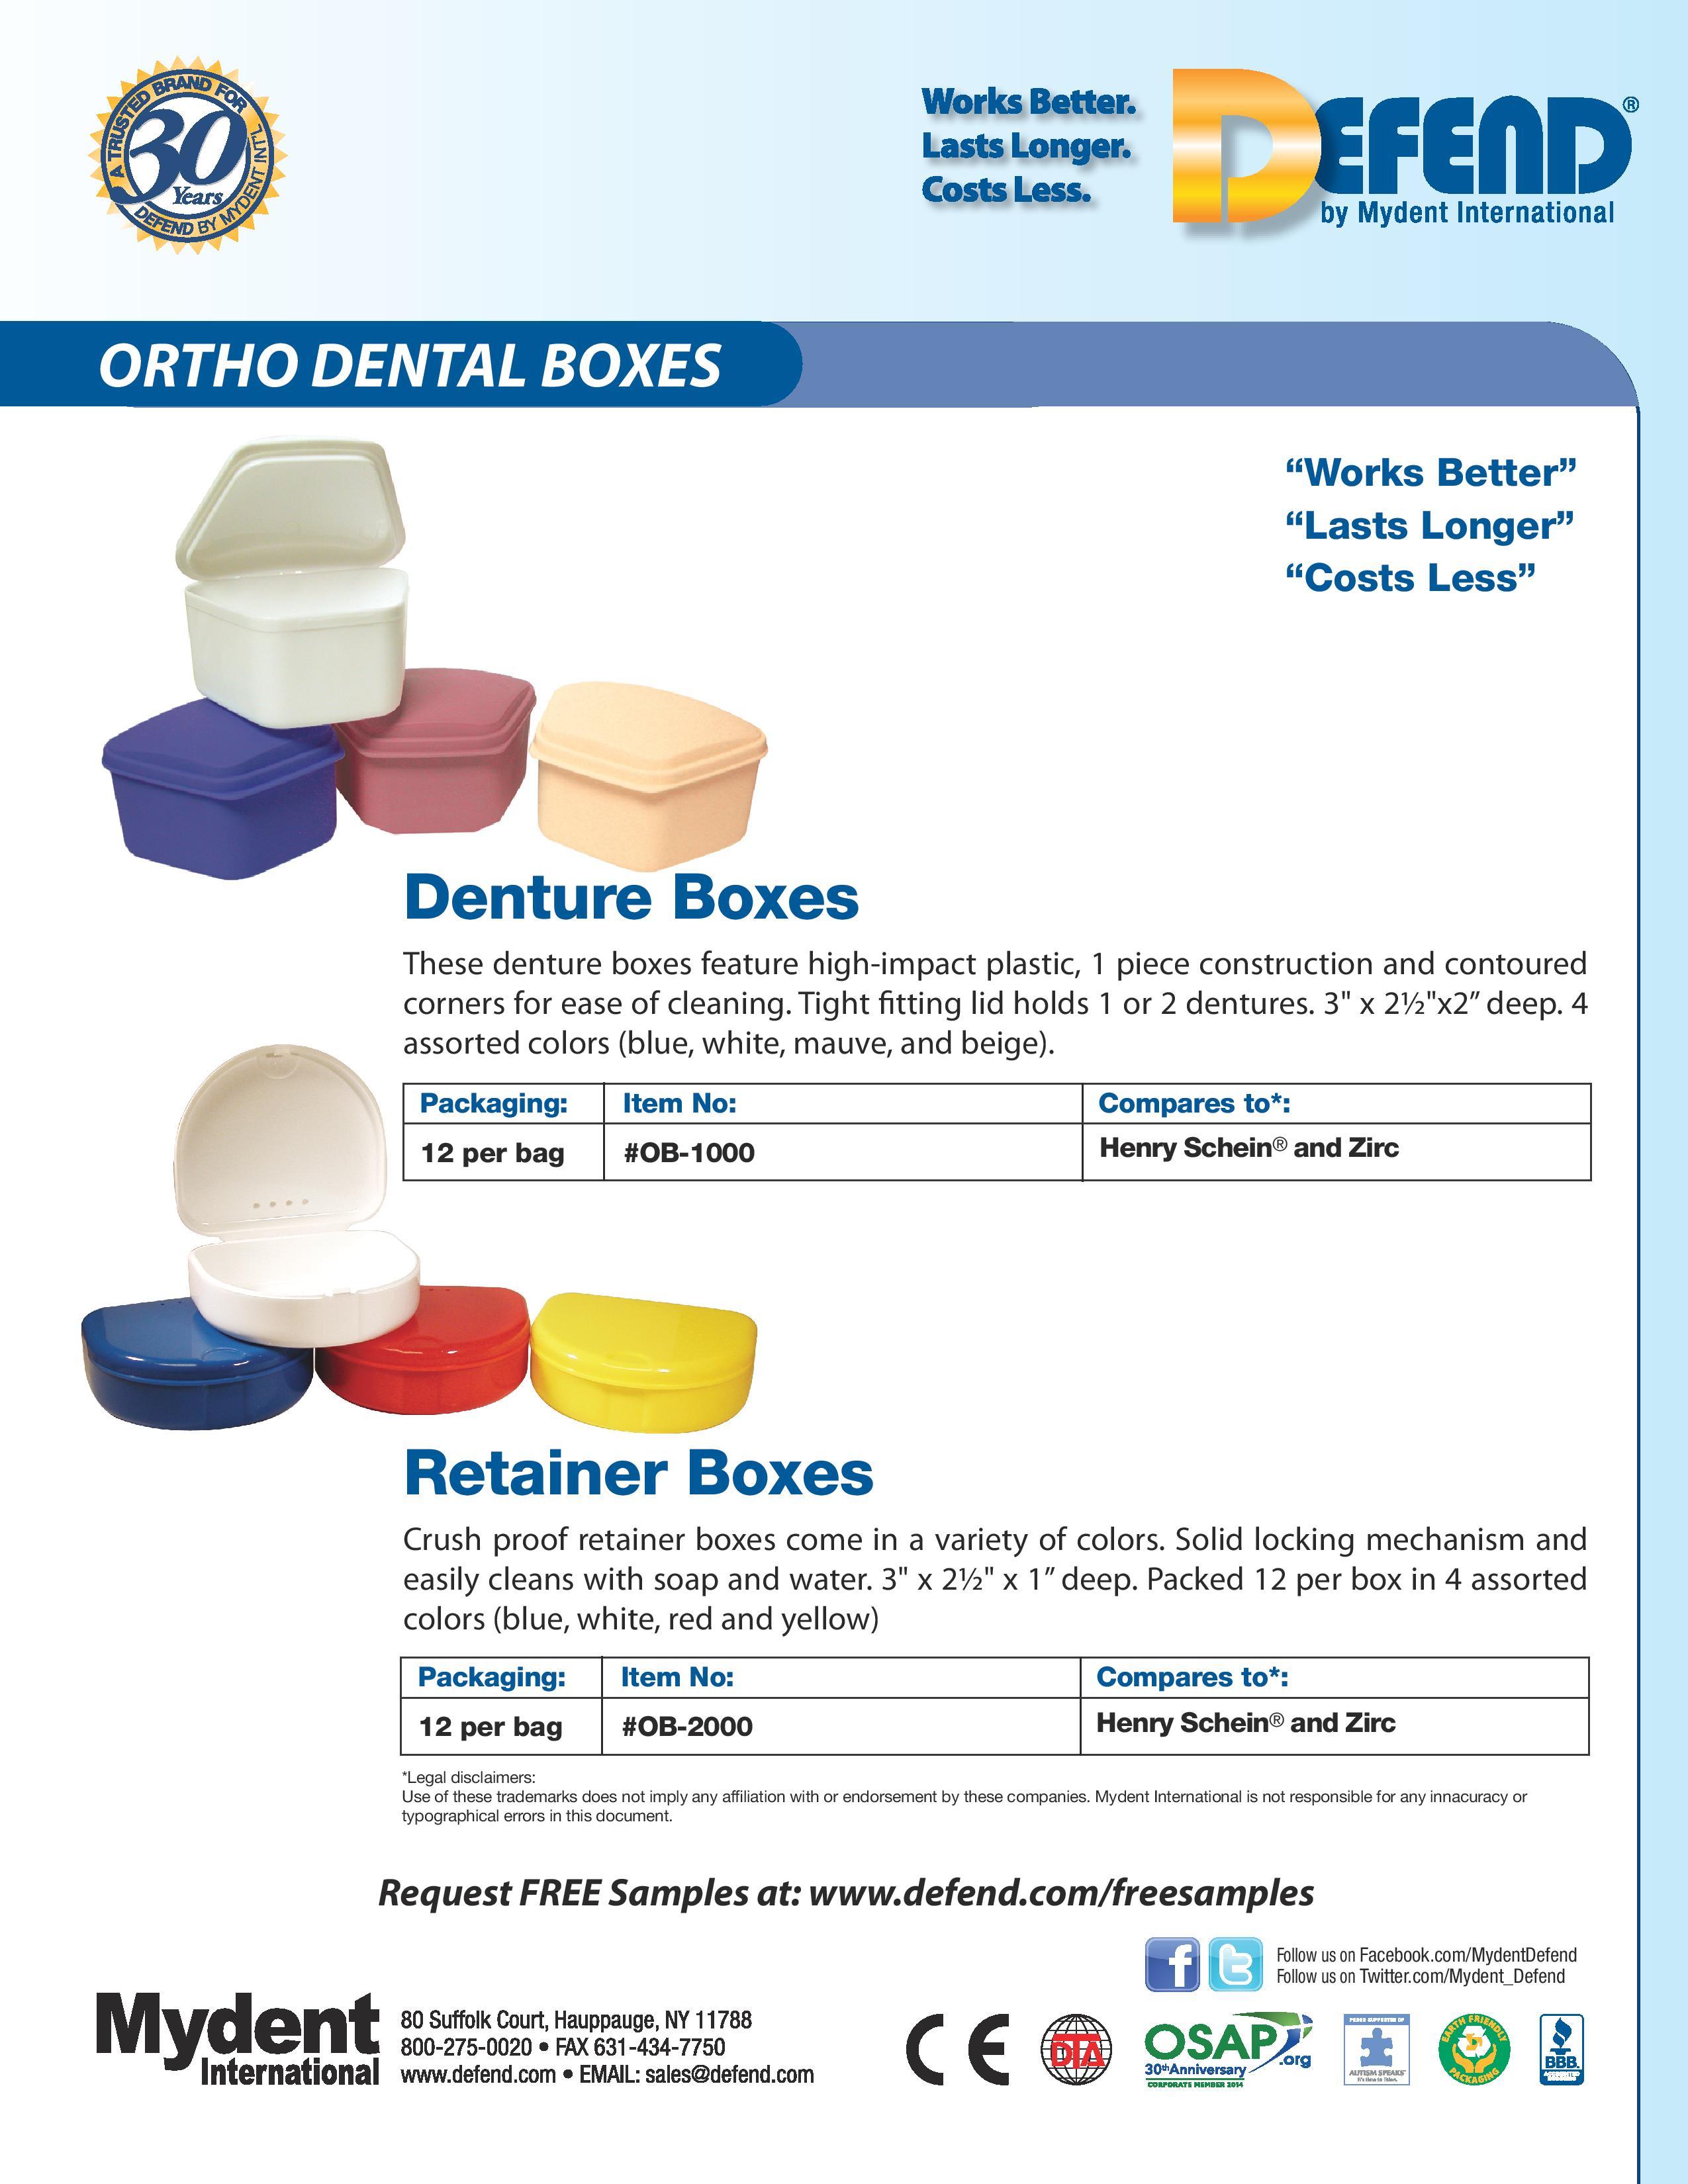 Ortho Dental Boxes